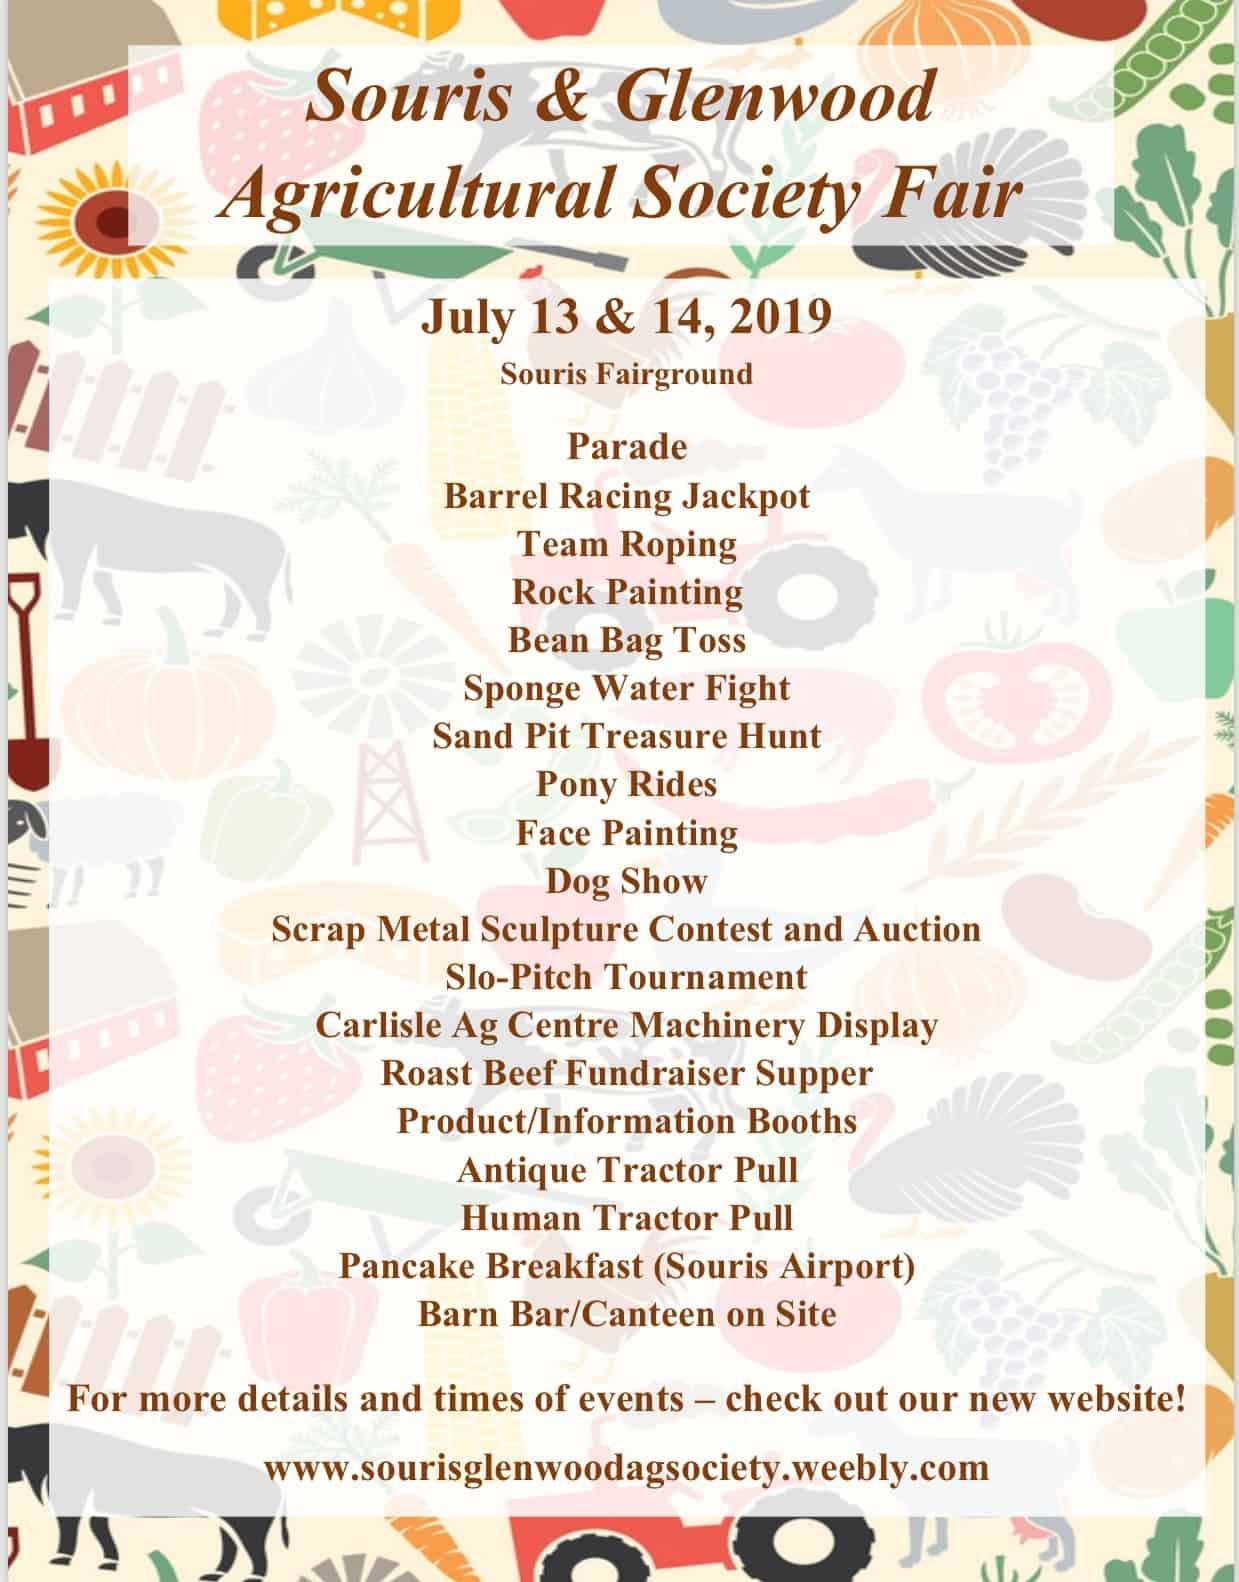 Souris & Glenwood Agricultural Society Fair @ Souris Fairgrounds